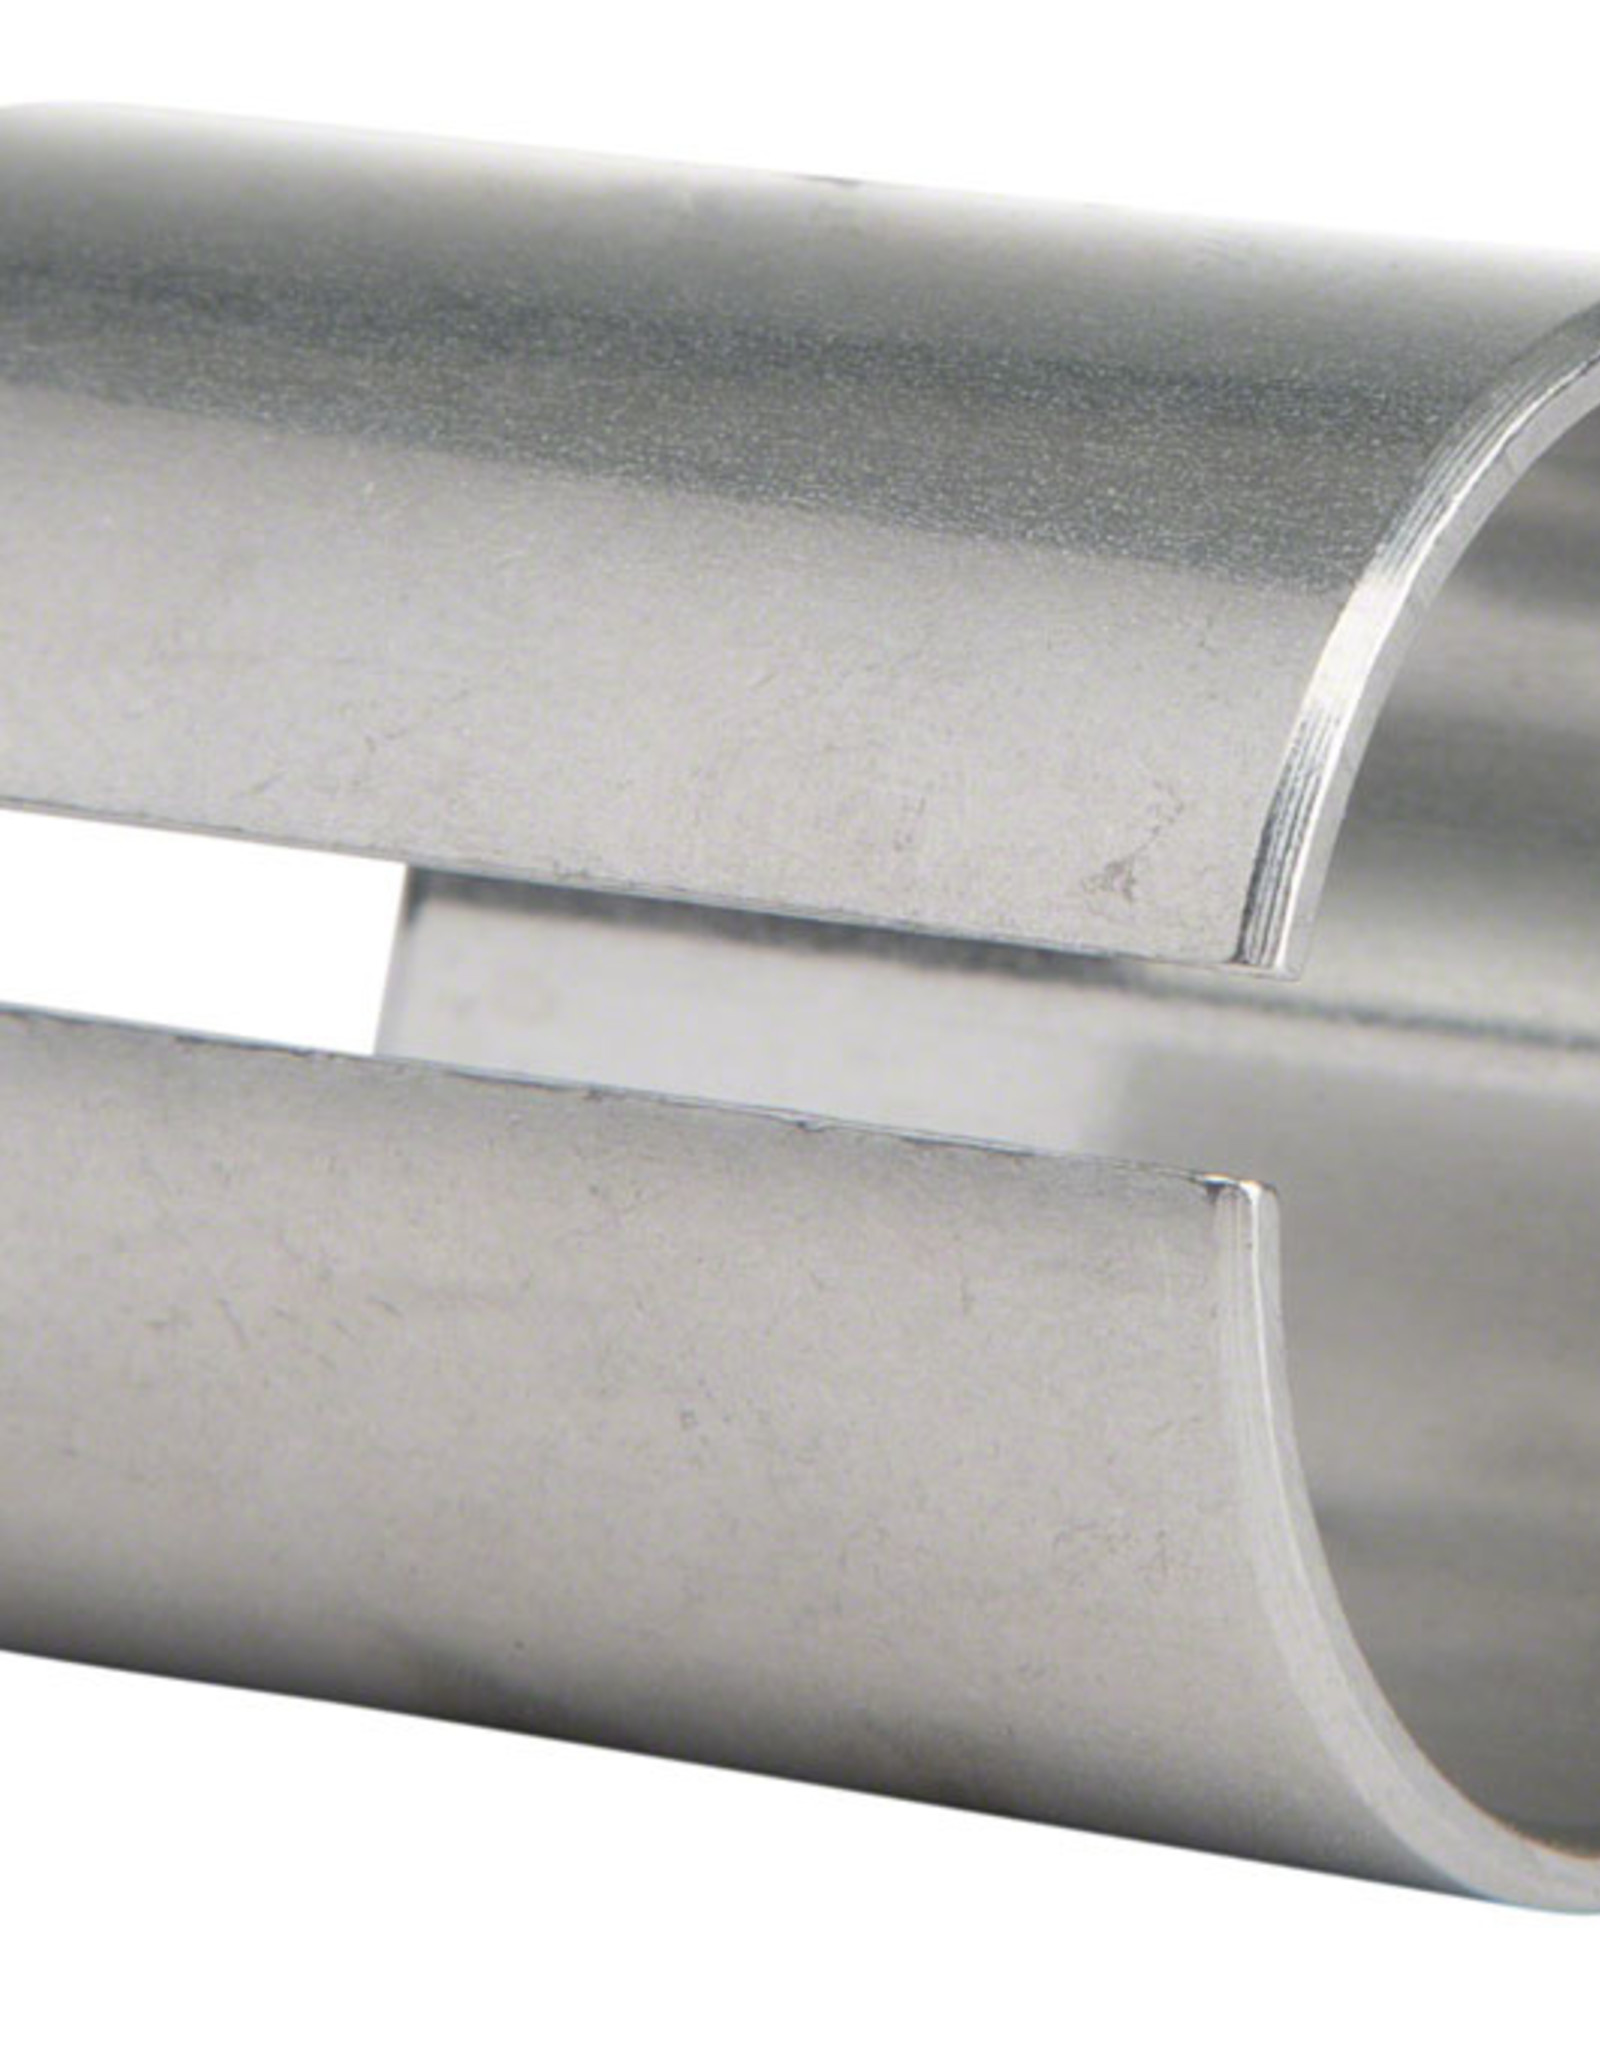 "Problem Solvers Steerer TubeShim 28.6 to 25.4 mm Adapts 1-1/8"" Threadless Stem to 1"" Threadless Steerer, 38 mm Height"